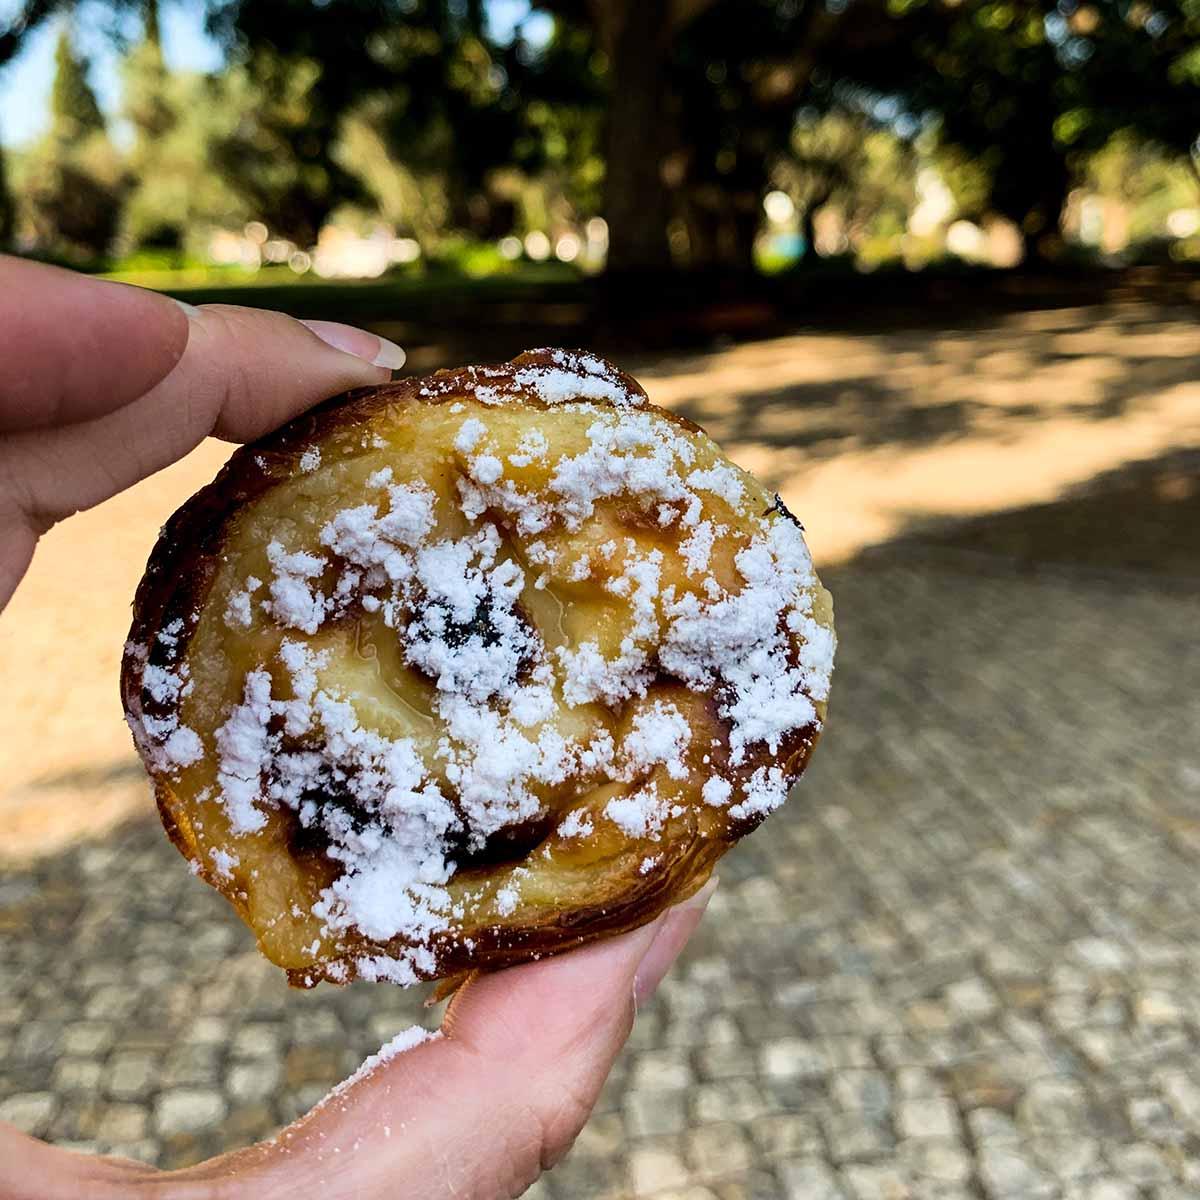 Pasteis de nata in Belem, Lisbon (Yum!)